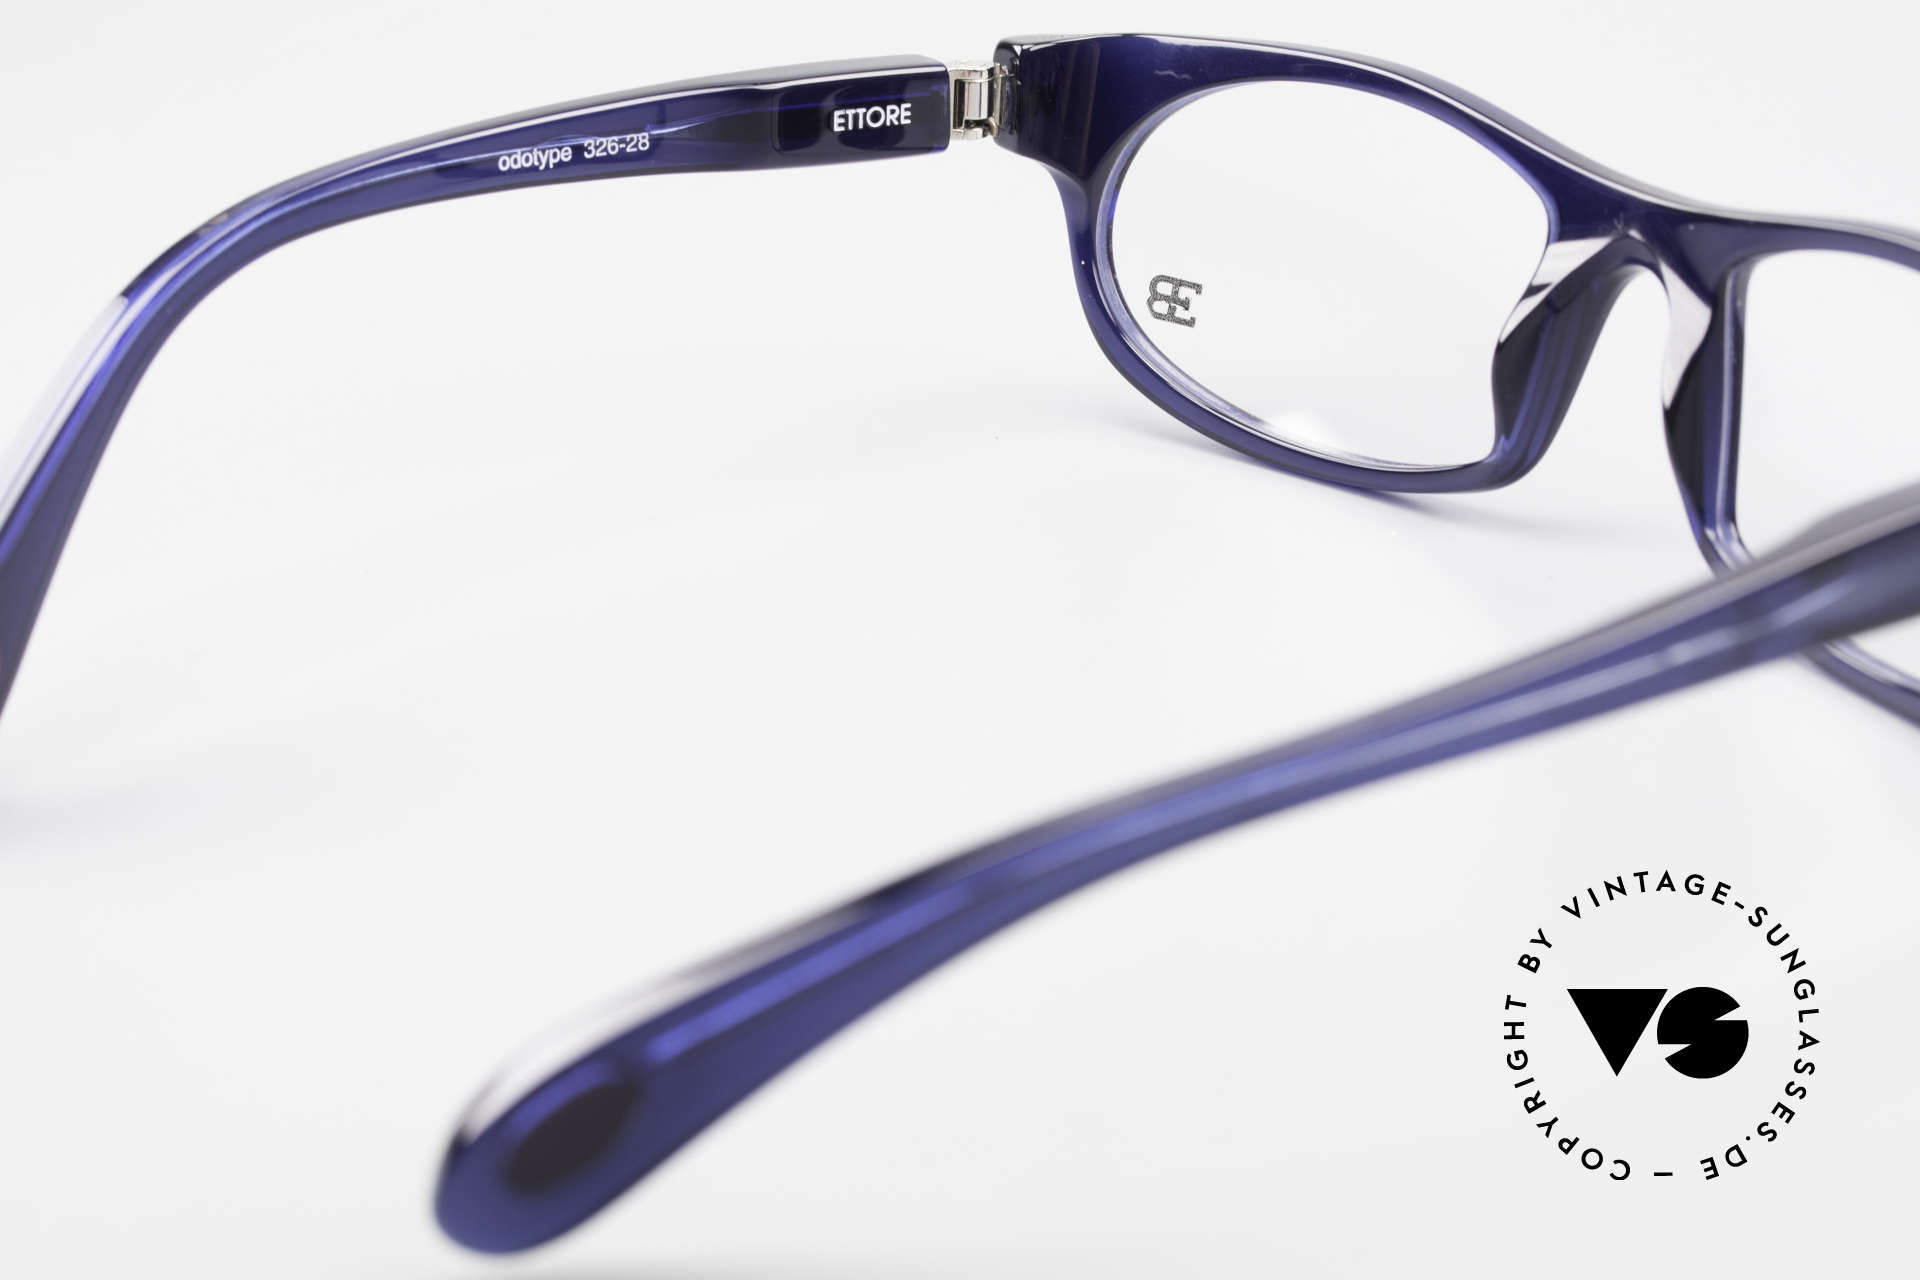 Bugatti 326 Odotype Sporty Designer Eyeglasses, DARK BLUE frame with original case & box, Made for Men